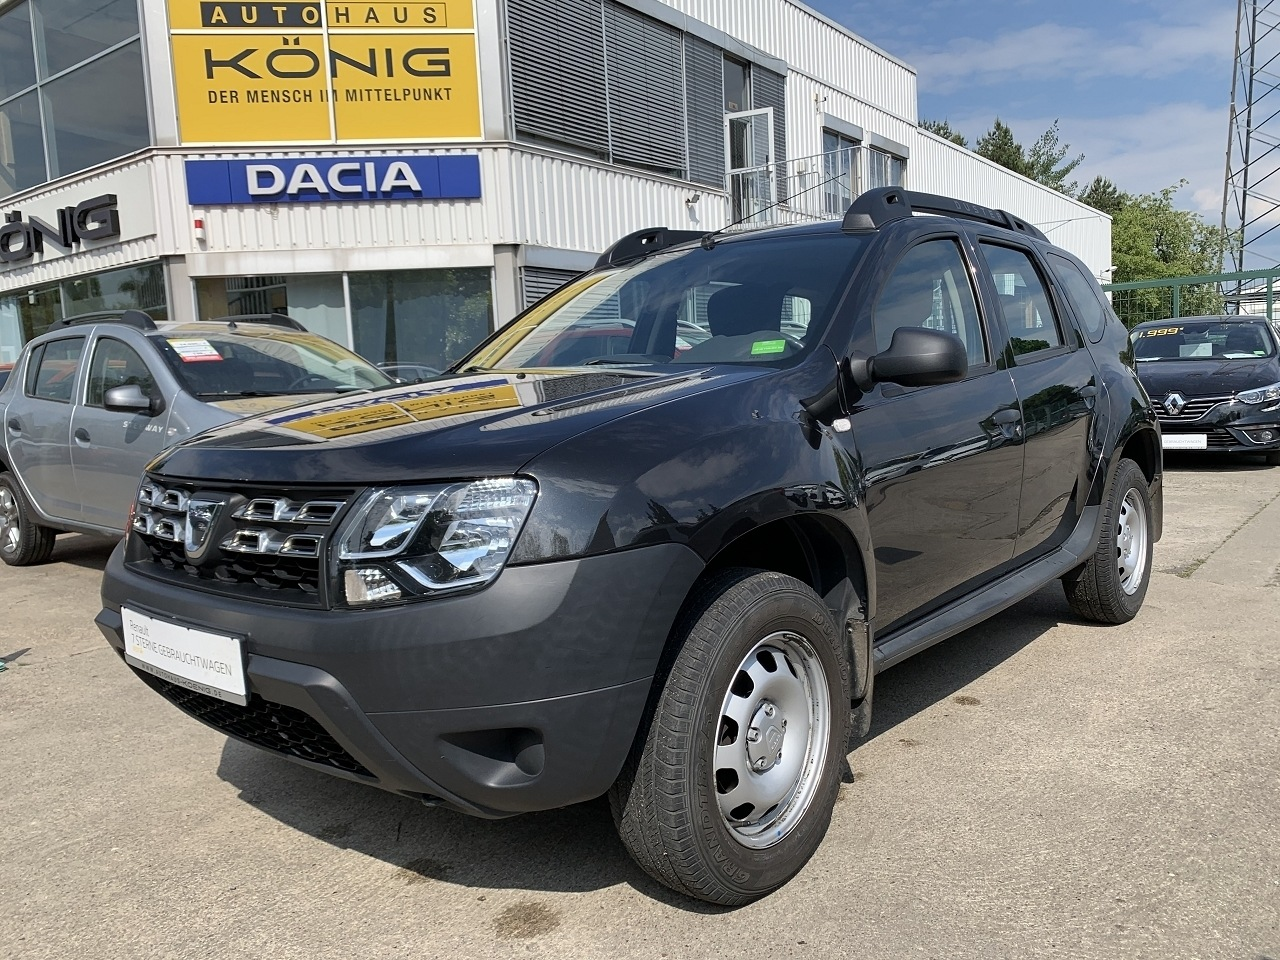 Dacia Duster 1.6 SCe Ice 4x2 Klimaanlage AHK, Jahr 2016, Benzin